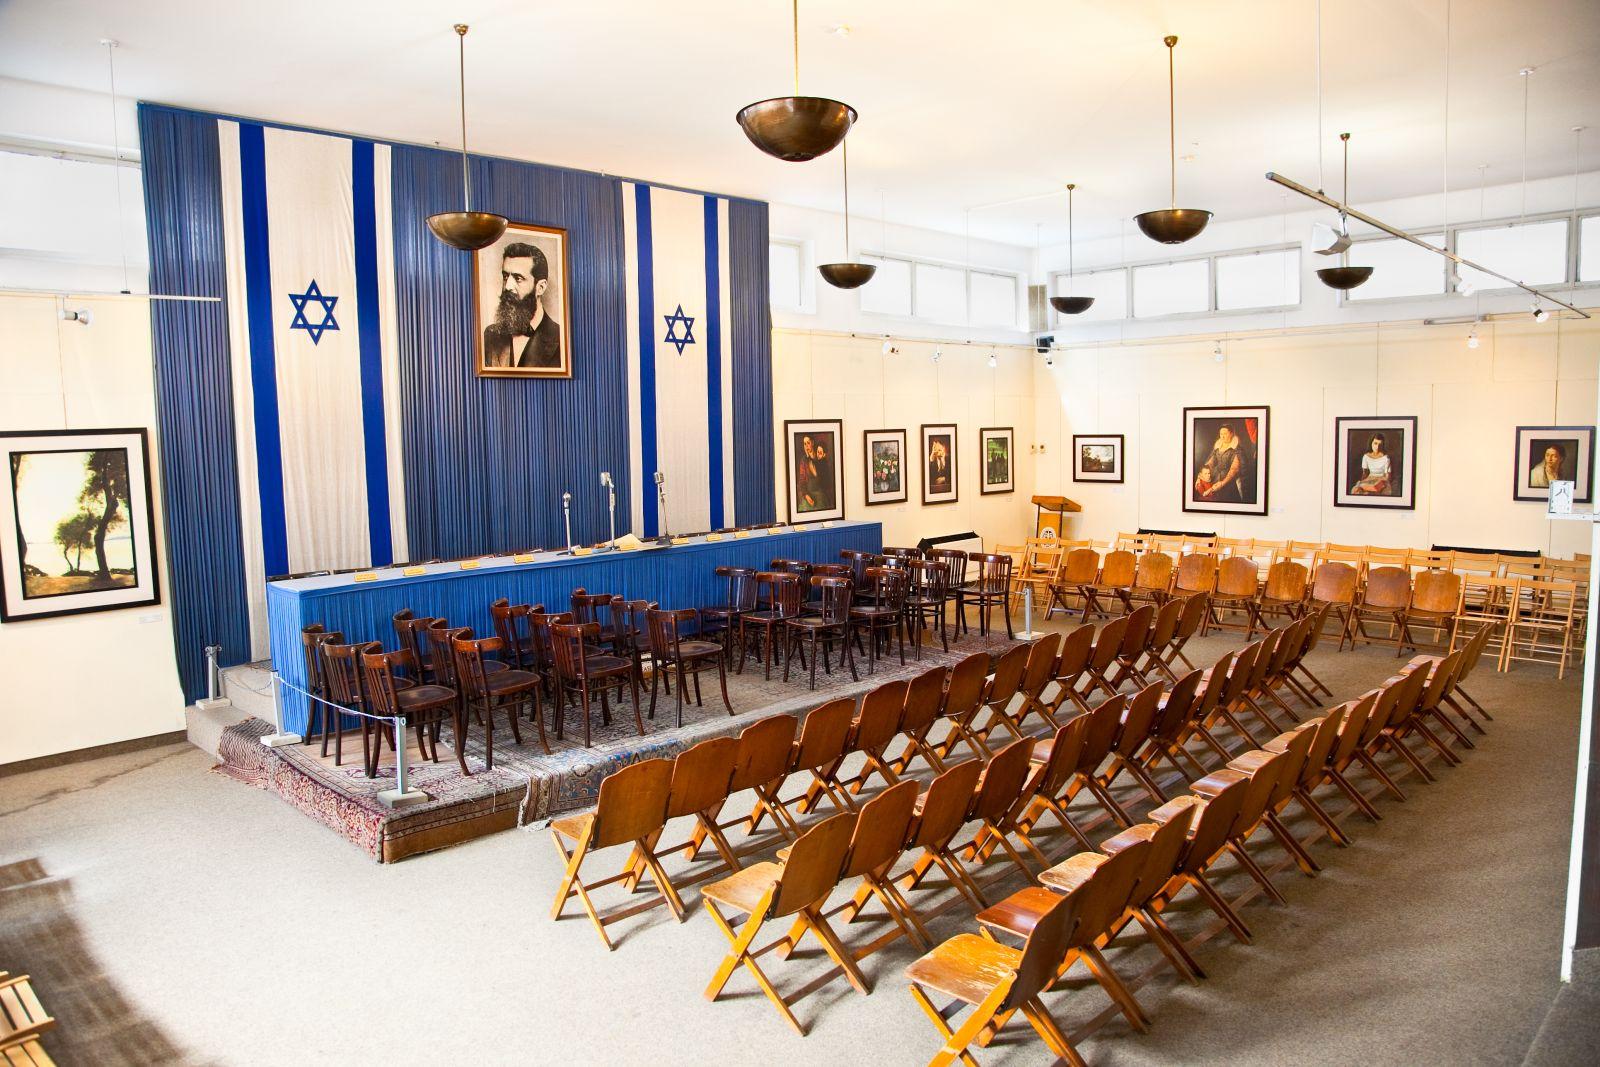 Inside Independence Hall. Photo via www.shutterstock.com